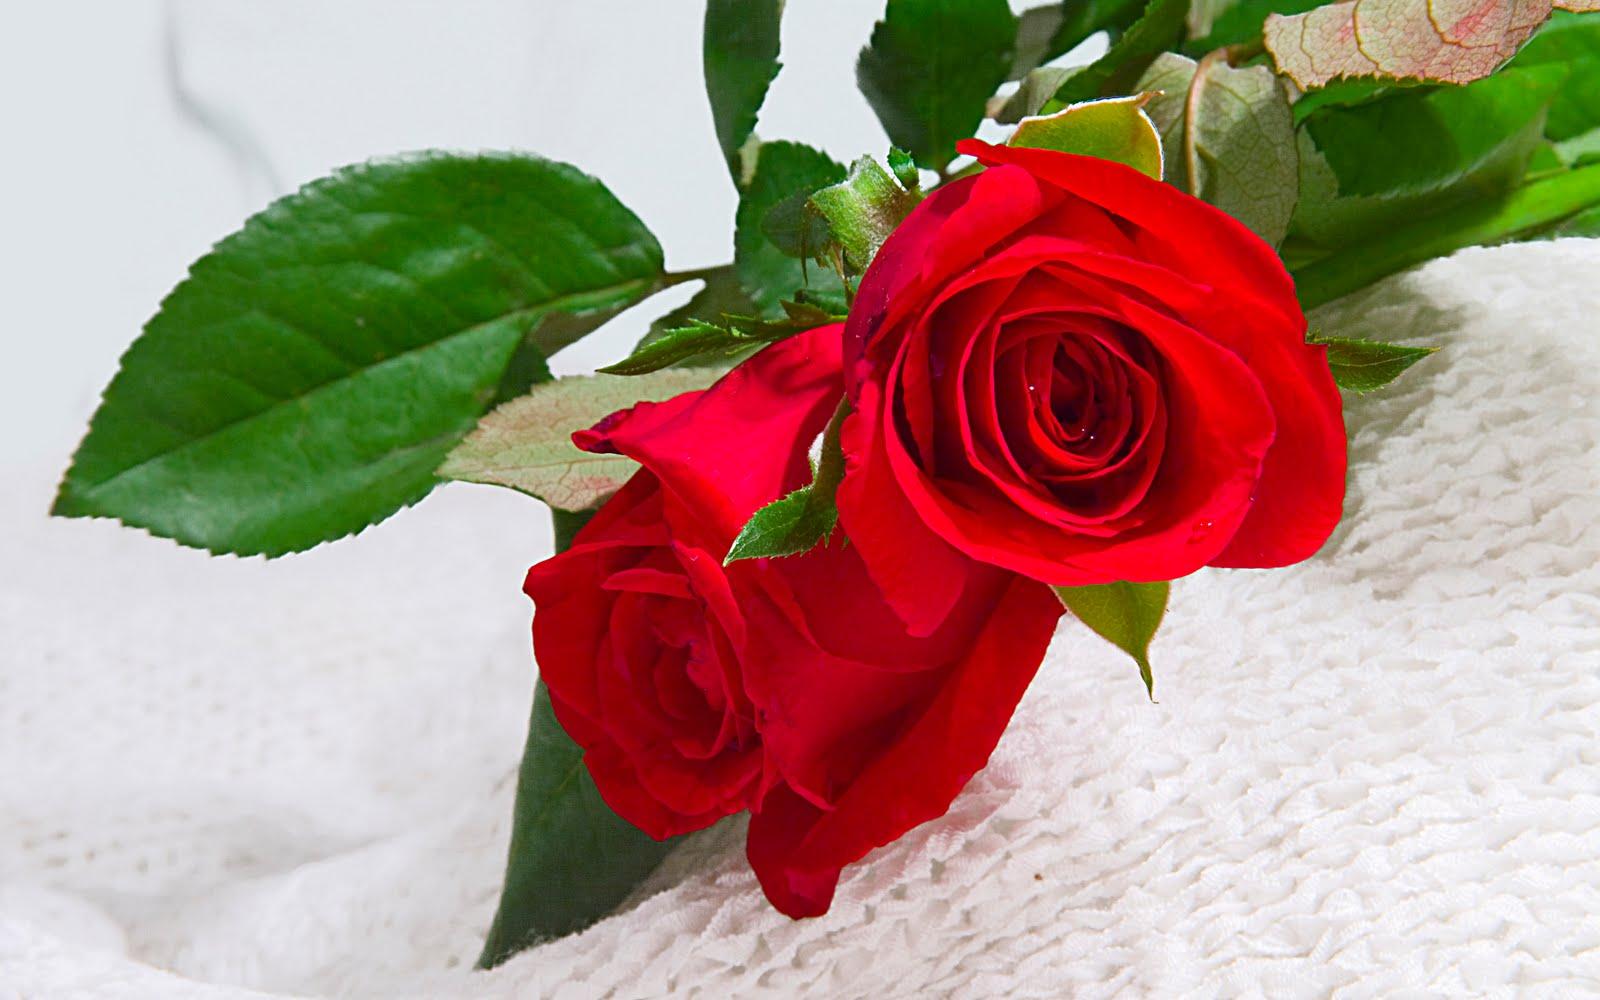 WALLPAPER: Rose Flowers Wallpaper